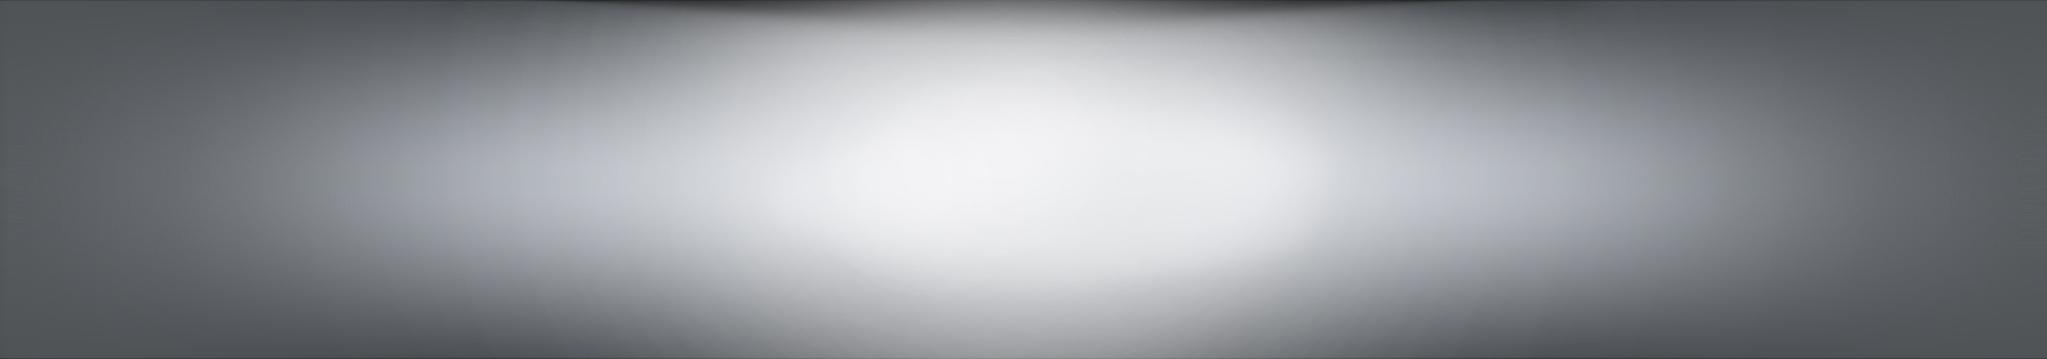 slider-background-gray-light-middle